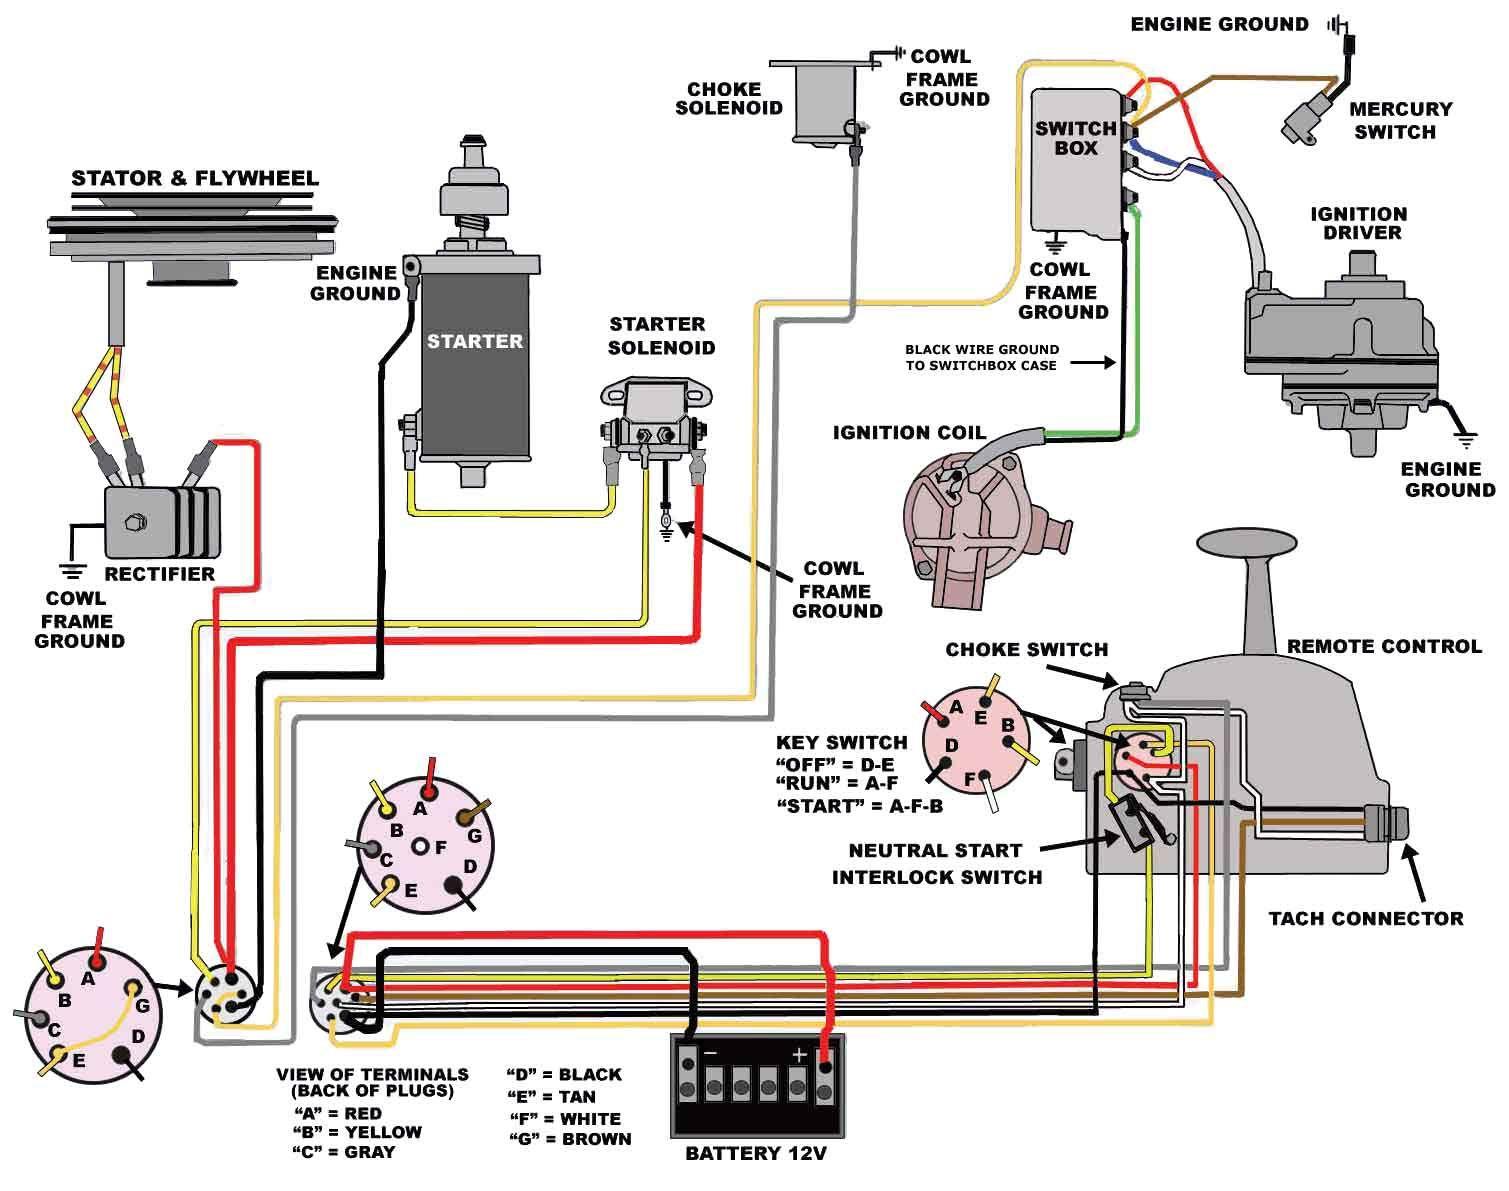 Suzuki Outboard Wiring Diagram | Manual E-Books - Evinrude Ignition Switch Wiring Diagram